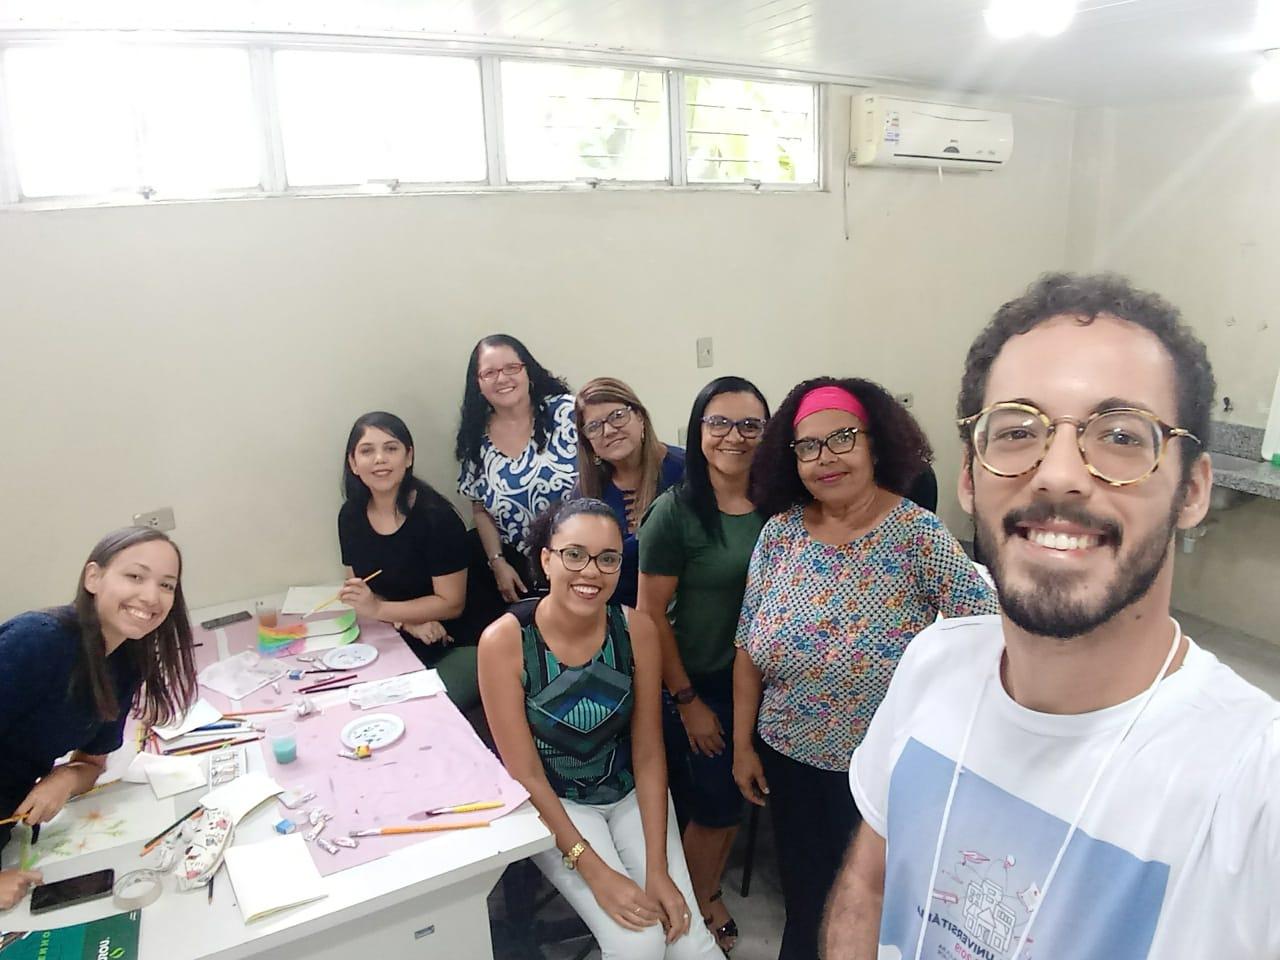 Semana Universitária 2019 - Oficina Pintura para servidores - ICB